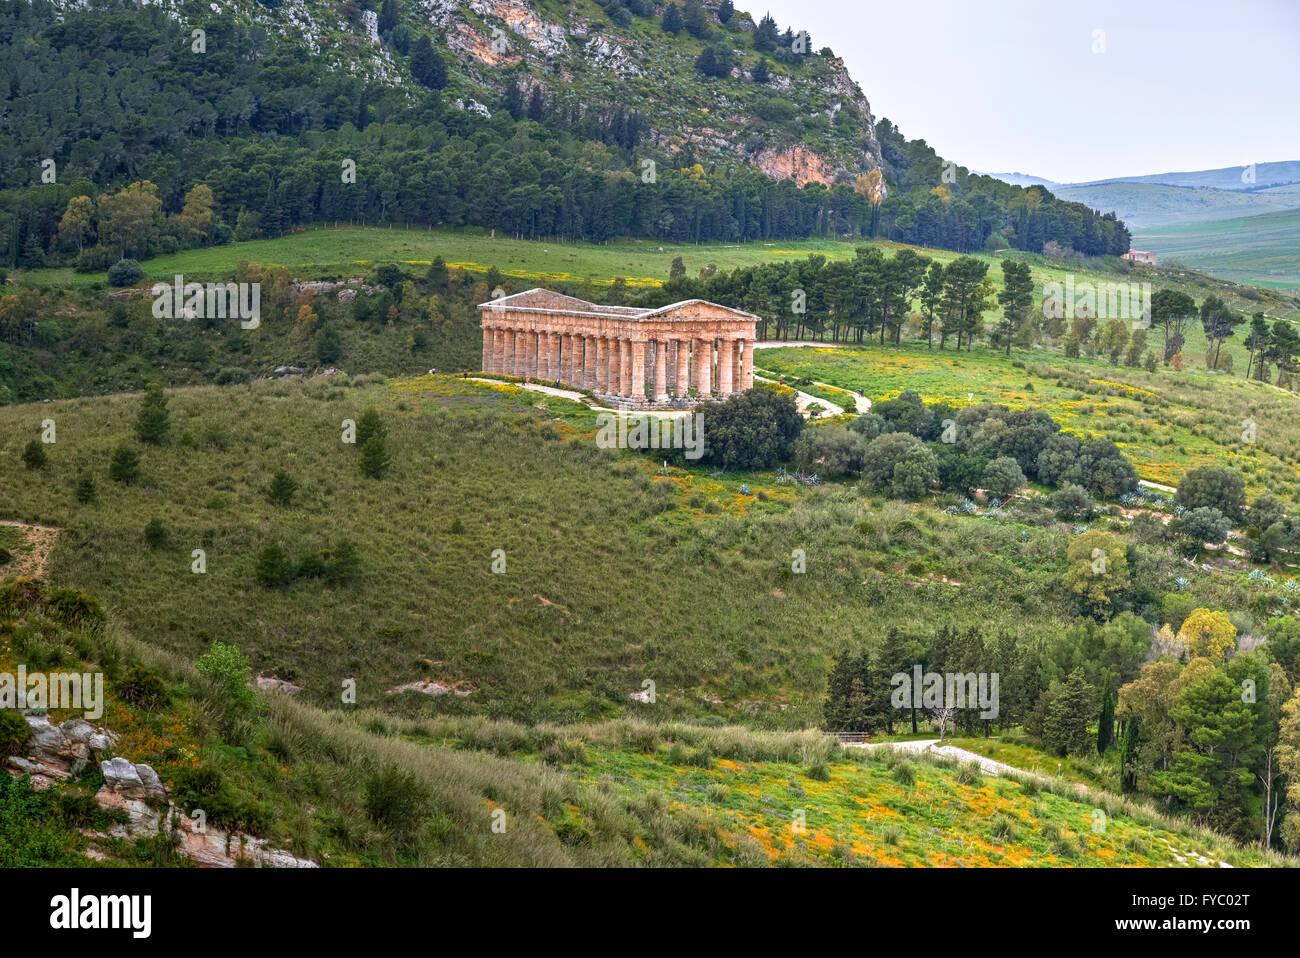 Calatafimi Segesta, Erice, Sicile, Italie, Photo Stock